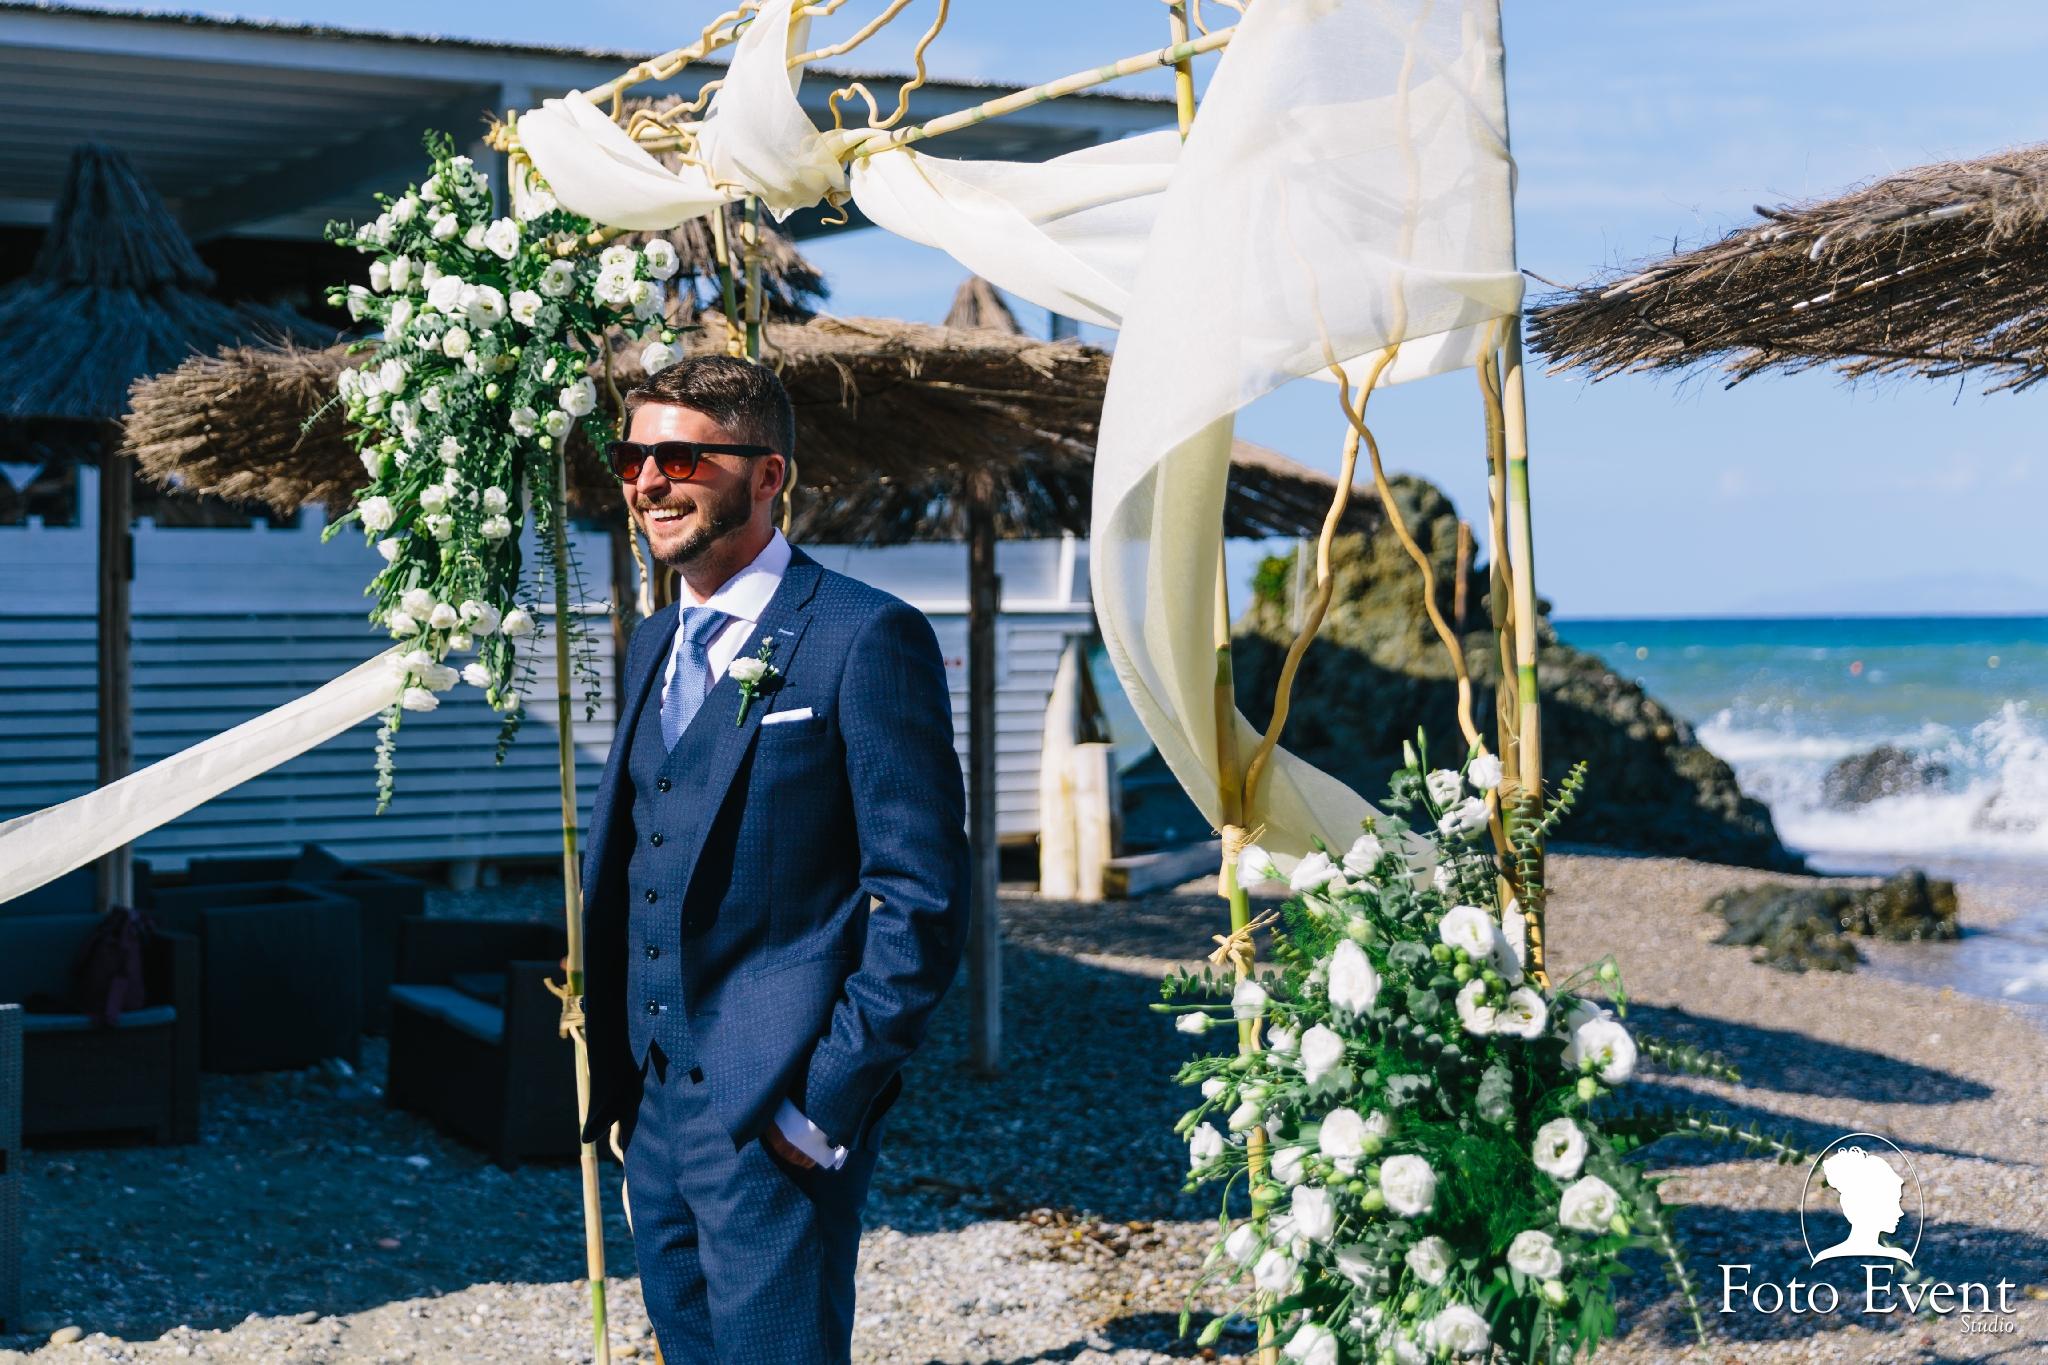 2018-09-25 Matrimonio Jessi e Simon Milligan 5DE 058